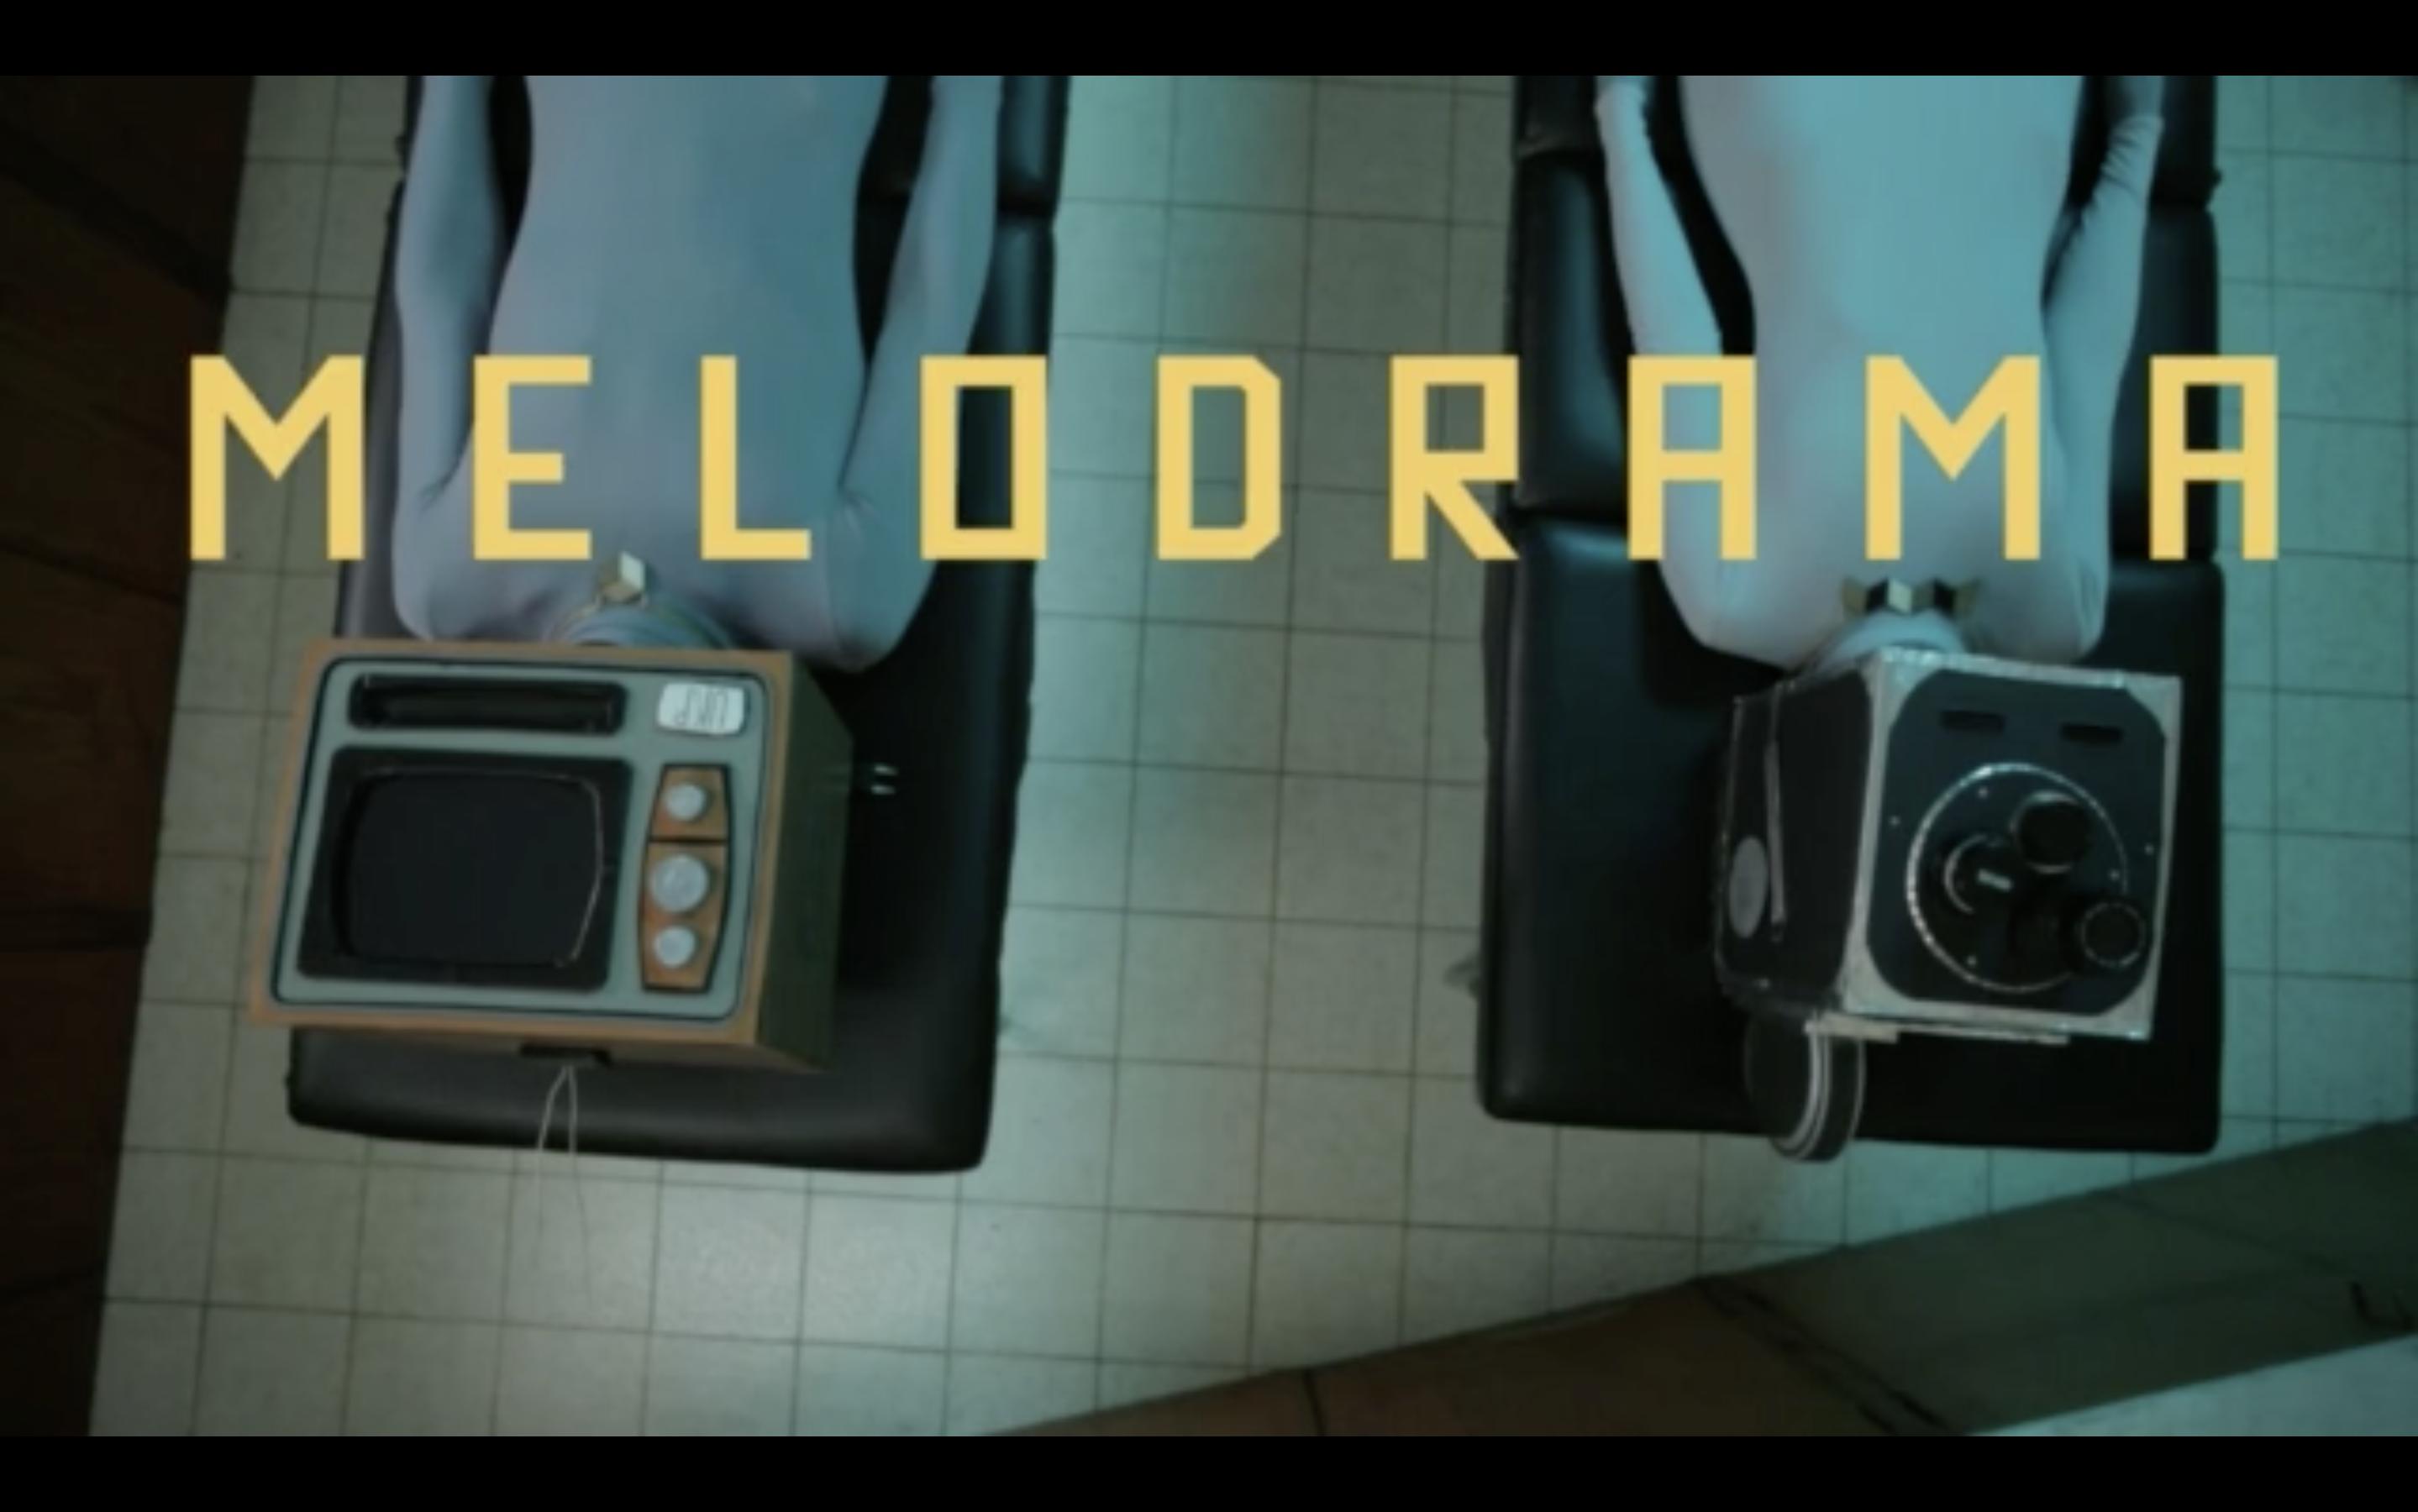 &#171;MELODRAMA<br> Cris Noda &#038; Cayetana H Cuyás ´s Shortfilm &#8211; D.O.P.